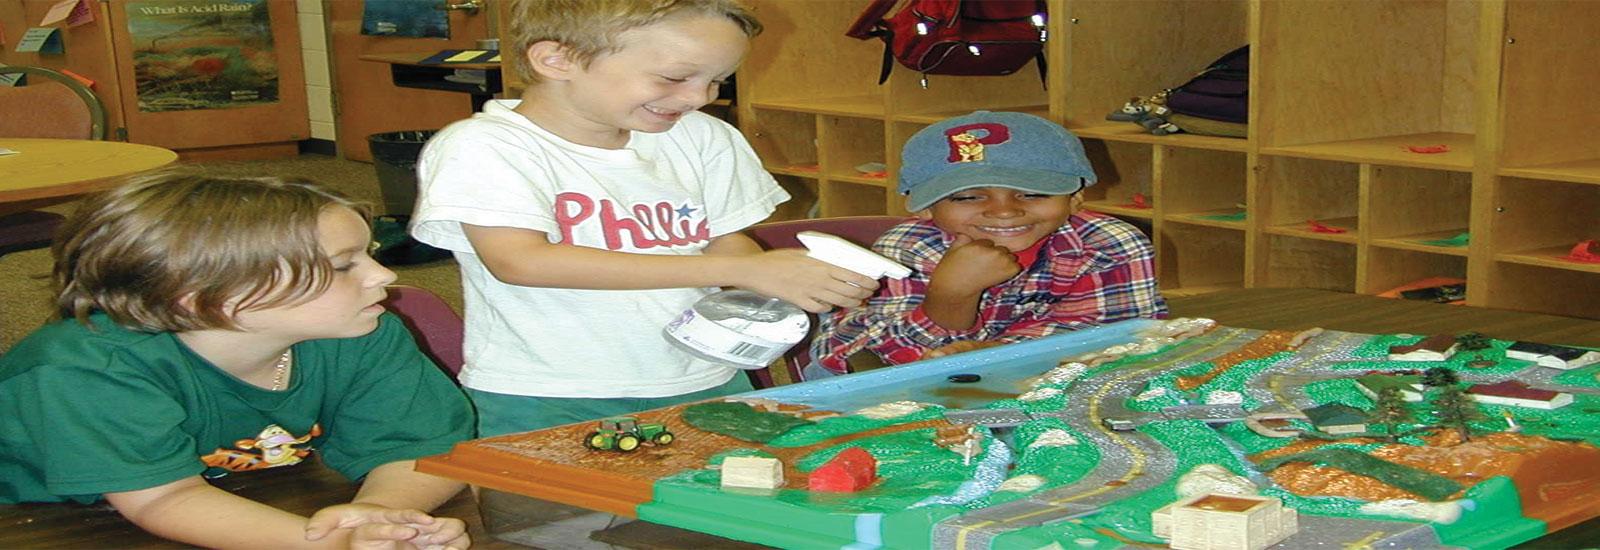 EnviroScape: Environmental Education Products